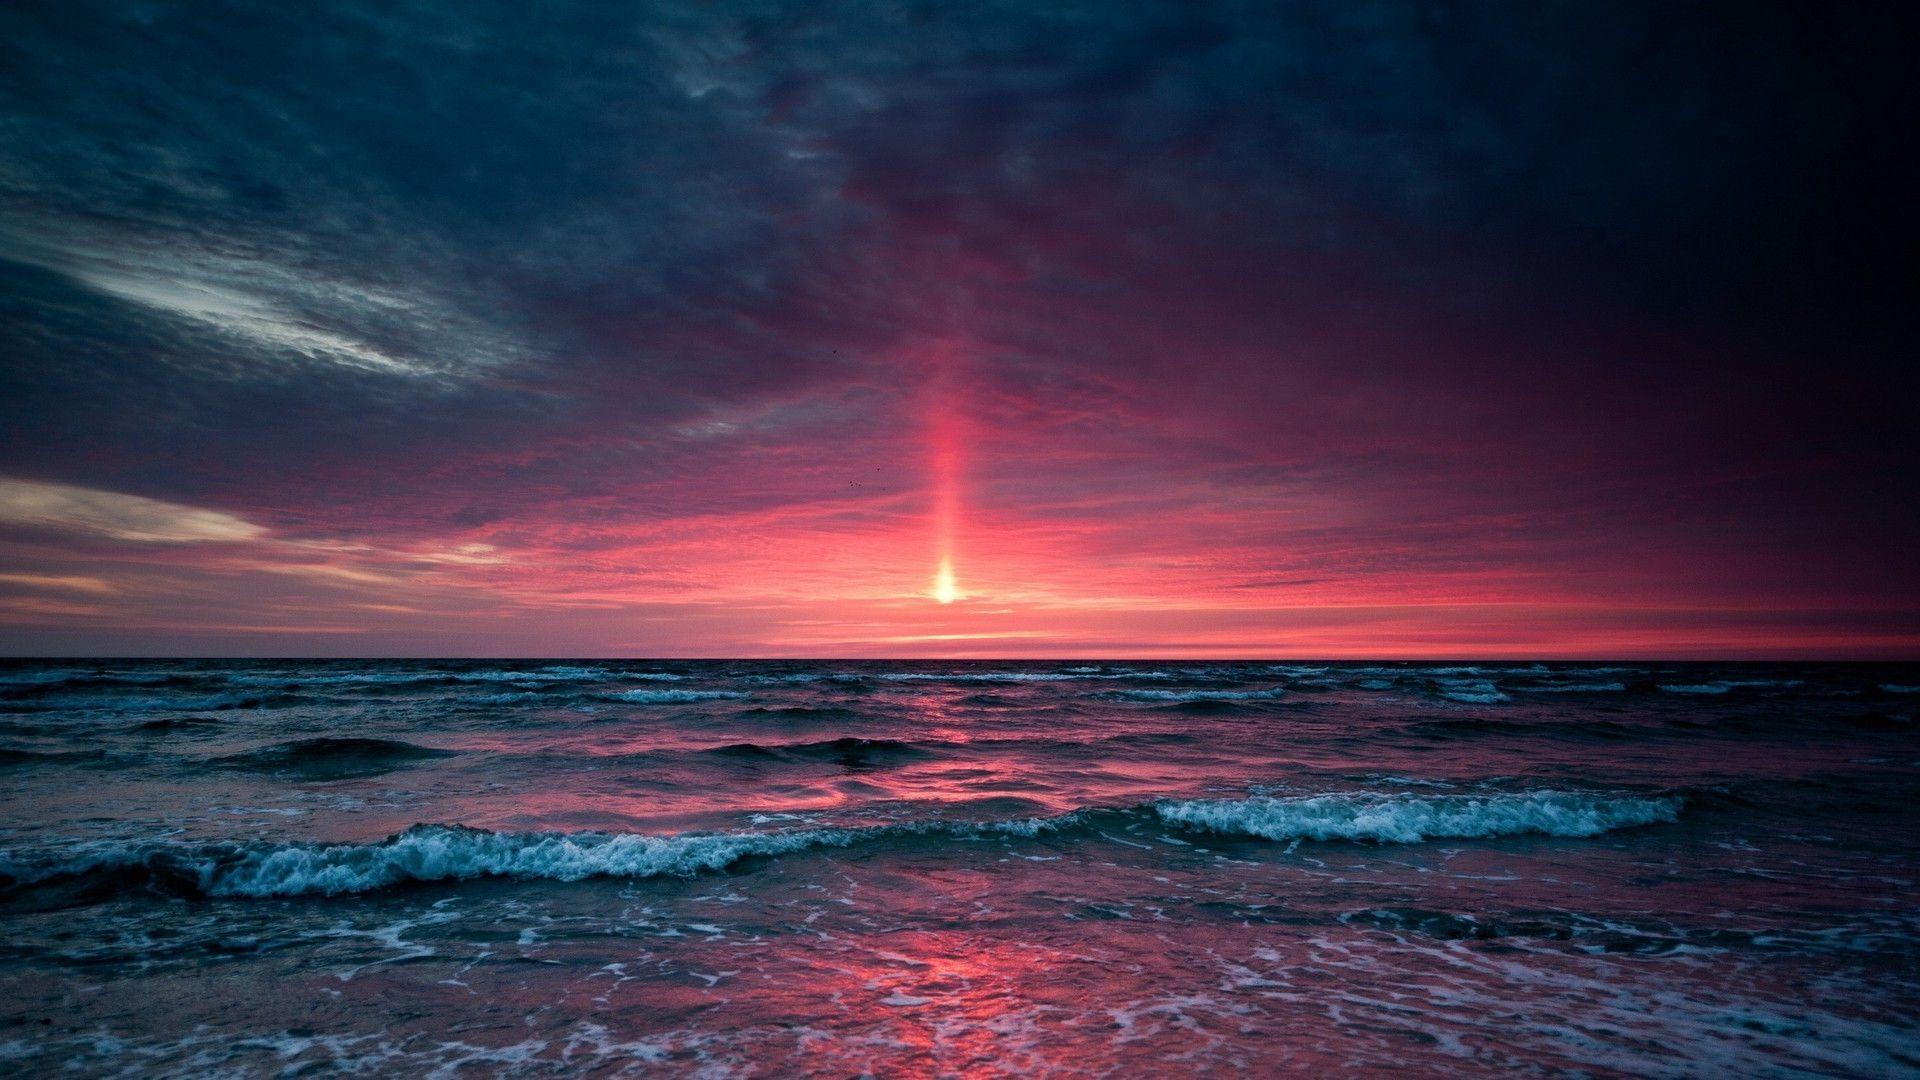 Aesthetic Sunset Desktop Wallpapers Top Free Aesthetic